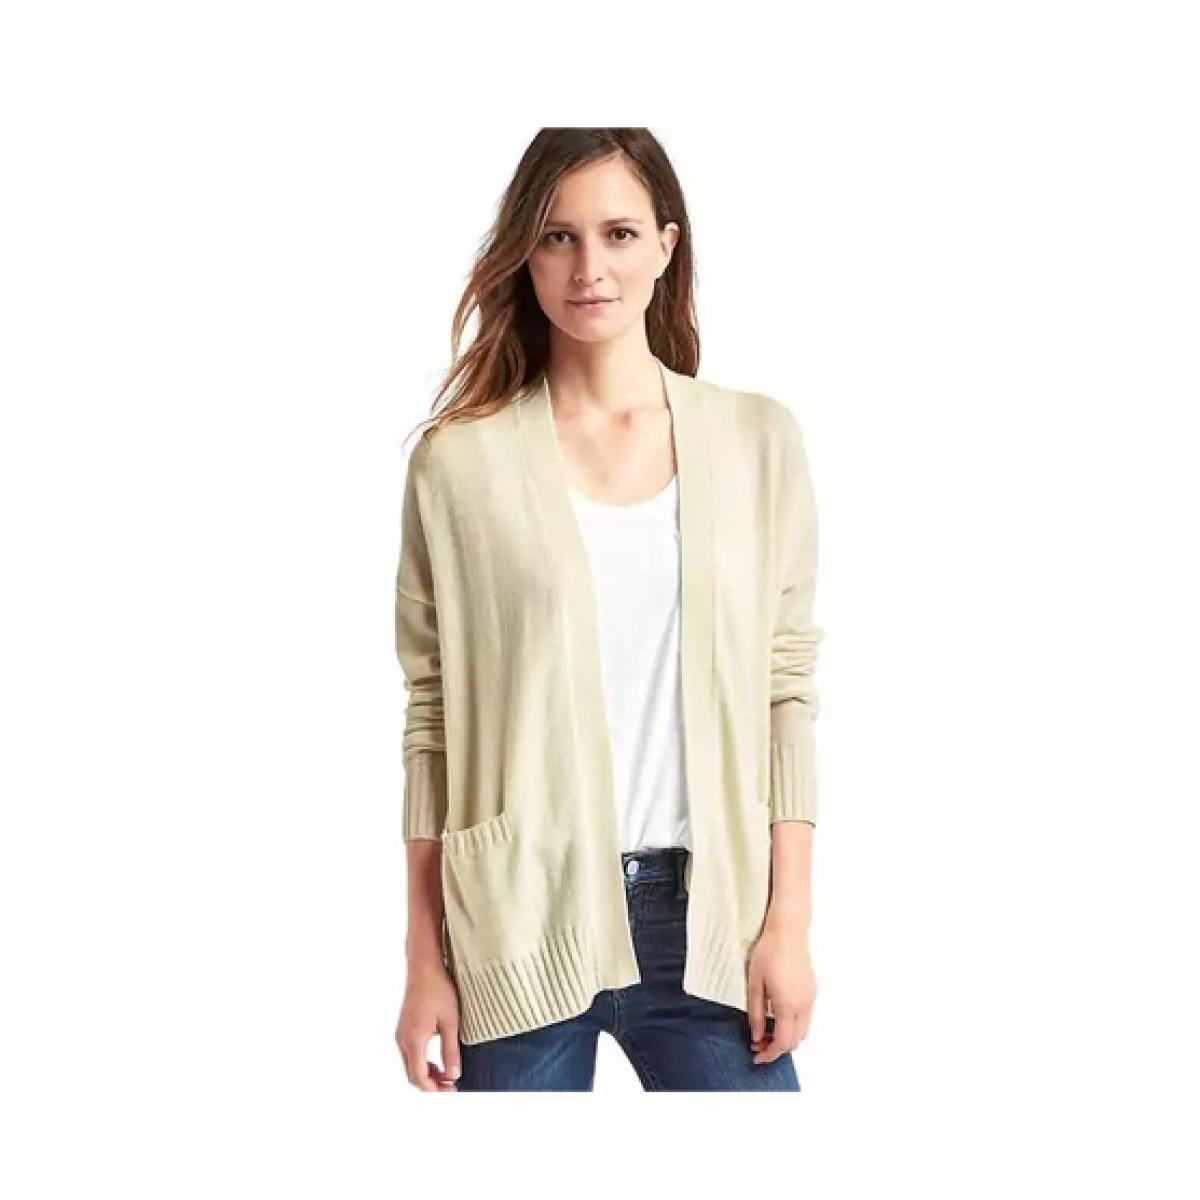 f766c9ee0642d4 Gap Open Cardigan Women's Sweater Price in Pakistan   Buy Gap Merino Wool  Blend Open Sweater Cream   iShopping.pk